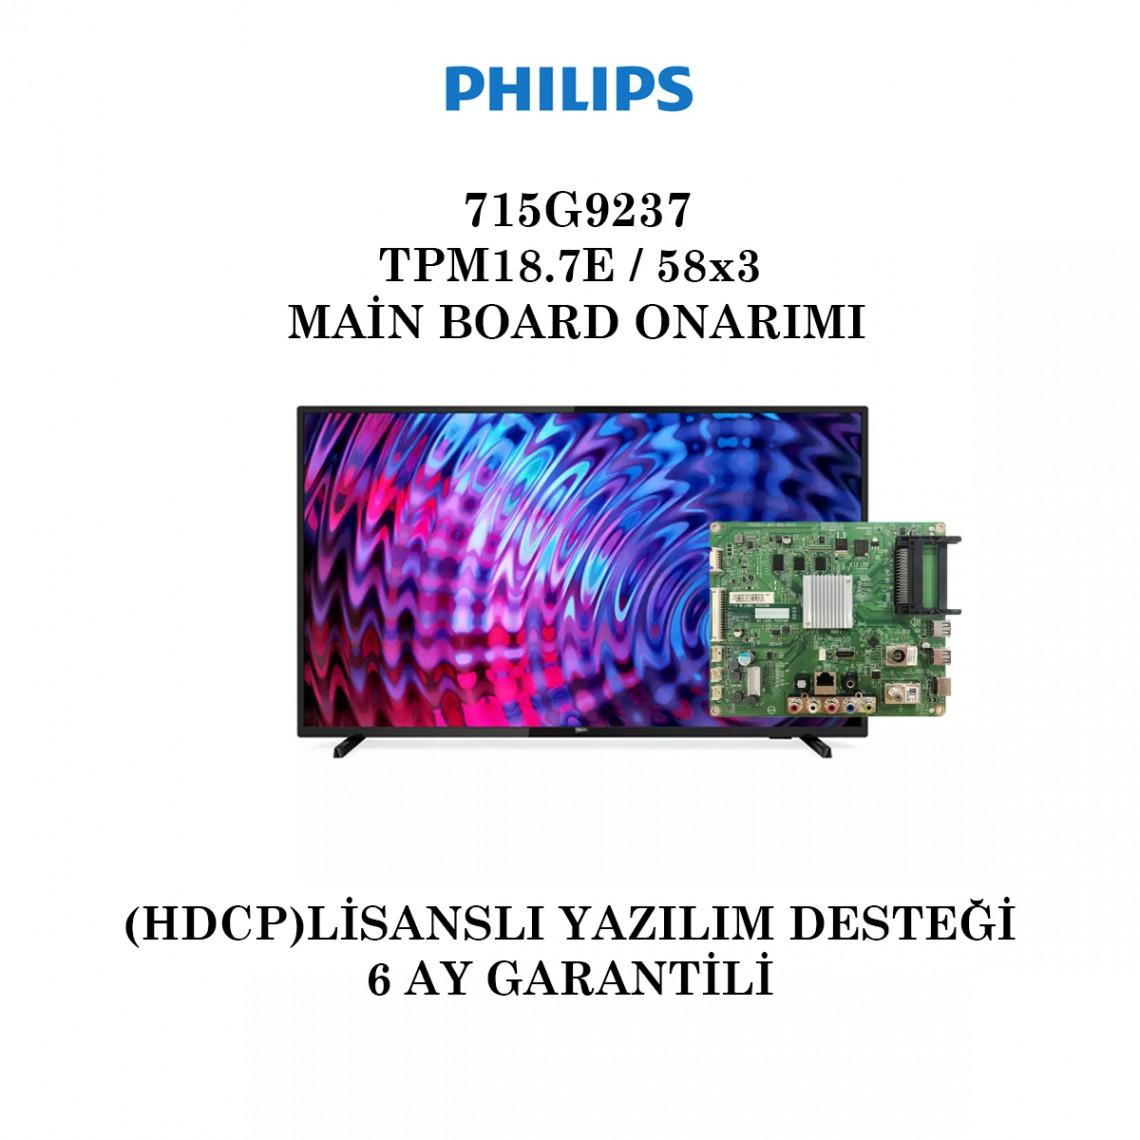 PHILIPS, TPM18.7E, (58x3), 715G9237, 715G9237-M01-B00-005K, 715G9237-M0C-B01-005T, 715G9237-M01-B00-005T, Main Board Onarımı